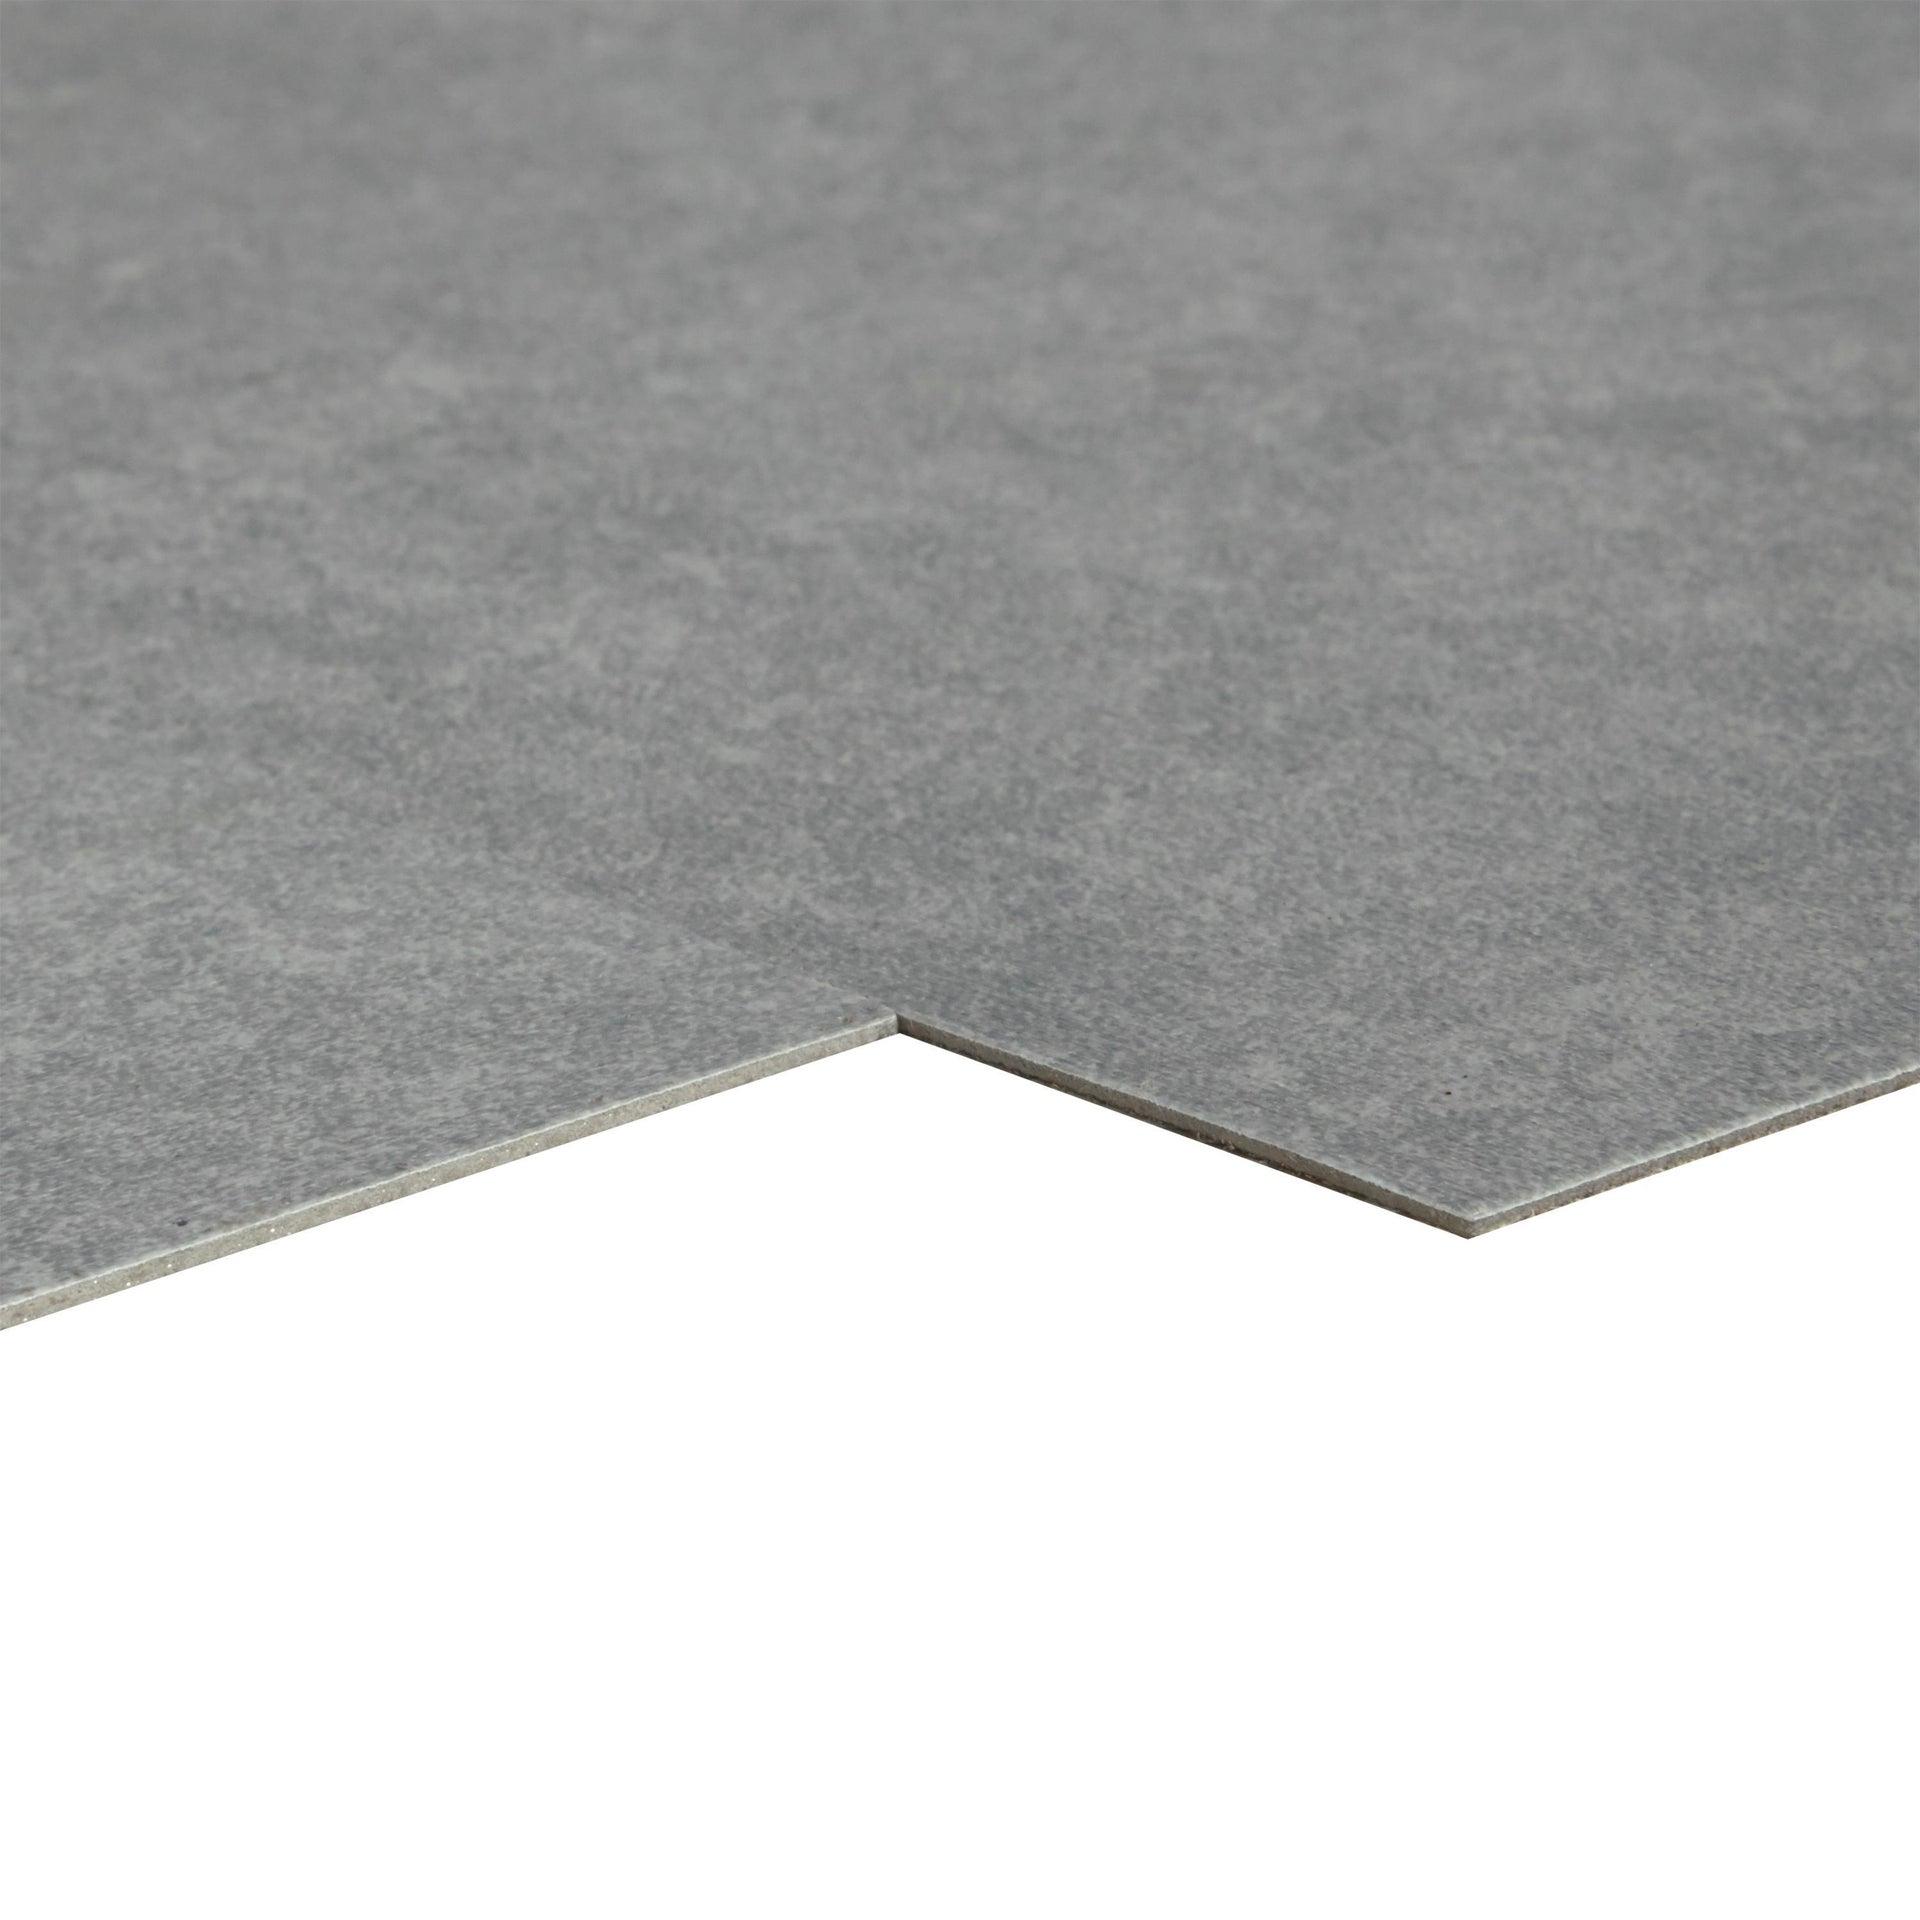 Pavimento PVC adesivo Kamet Sp 1.2 mm grigio / argento - 2